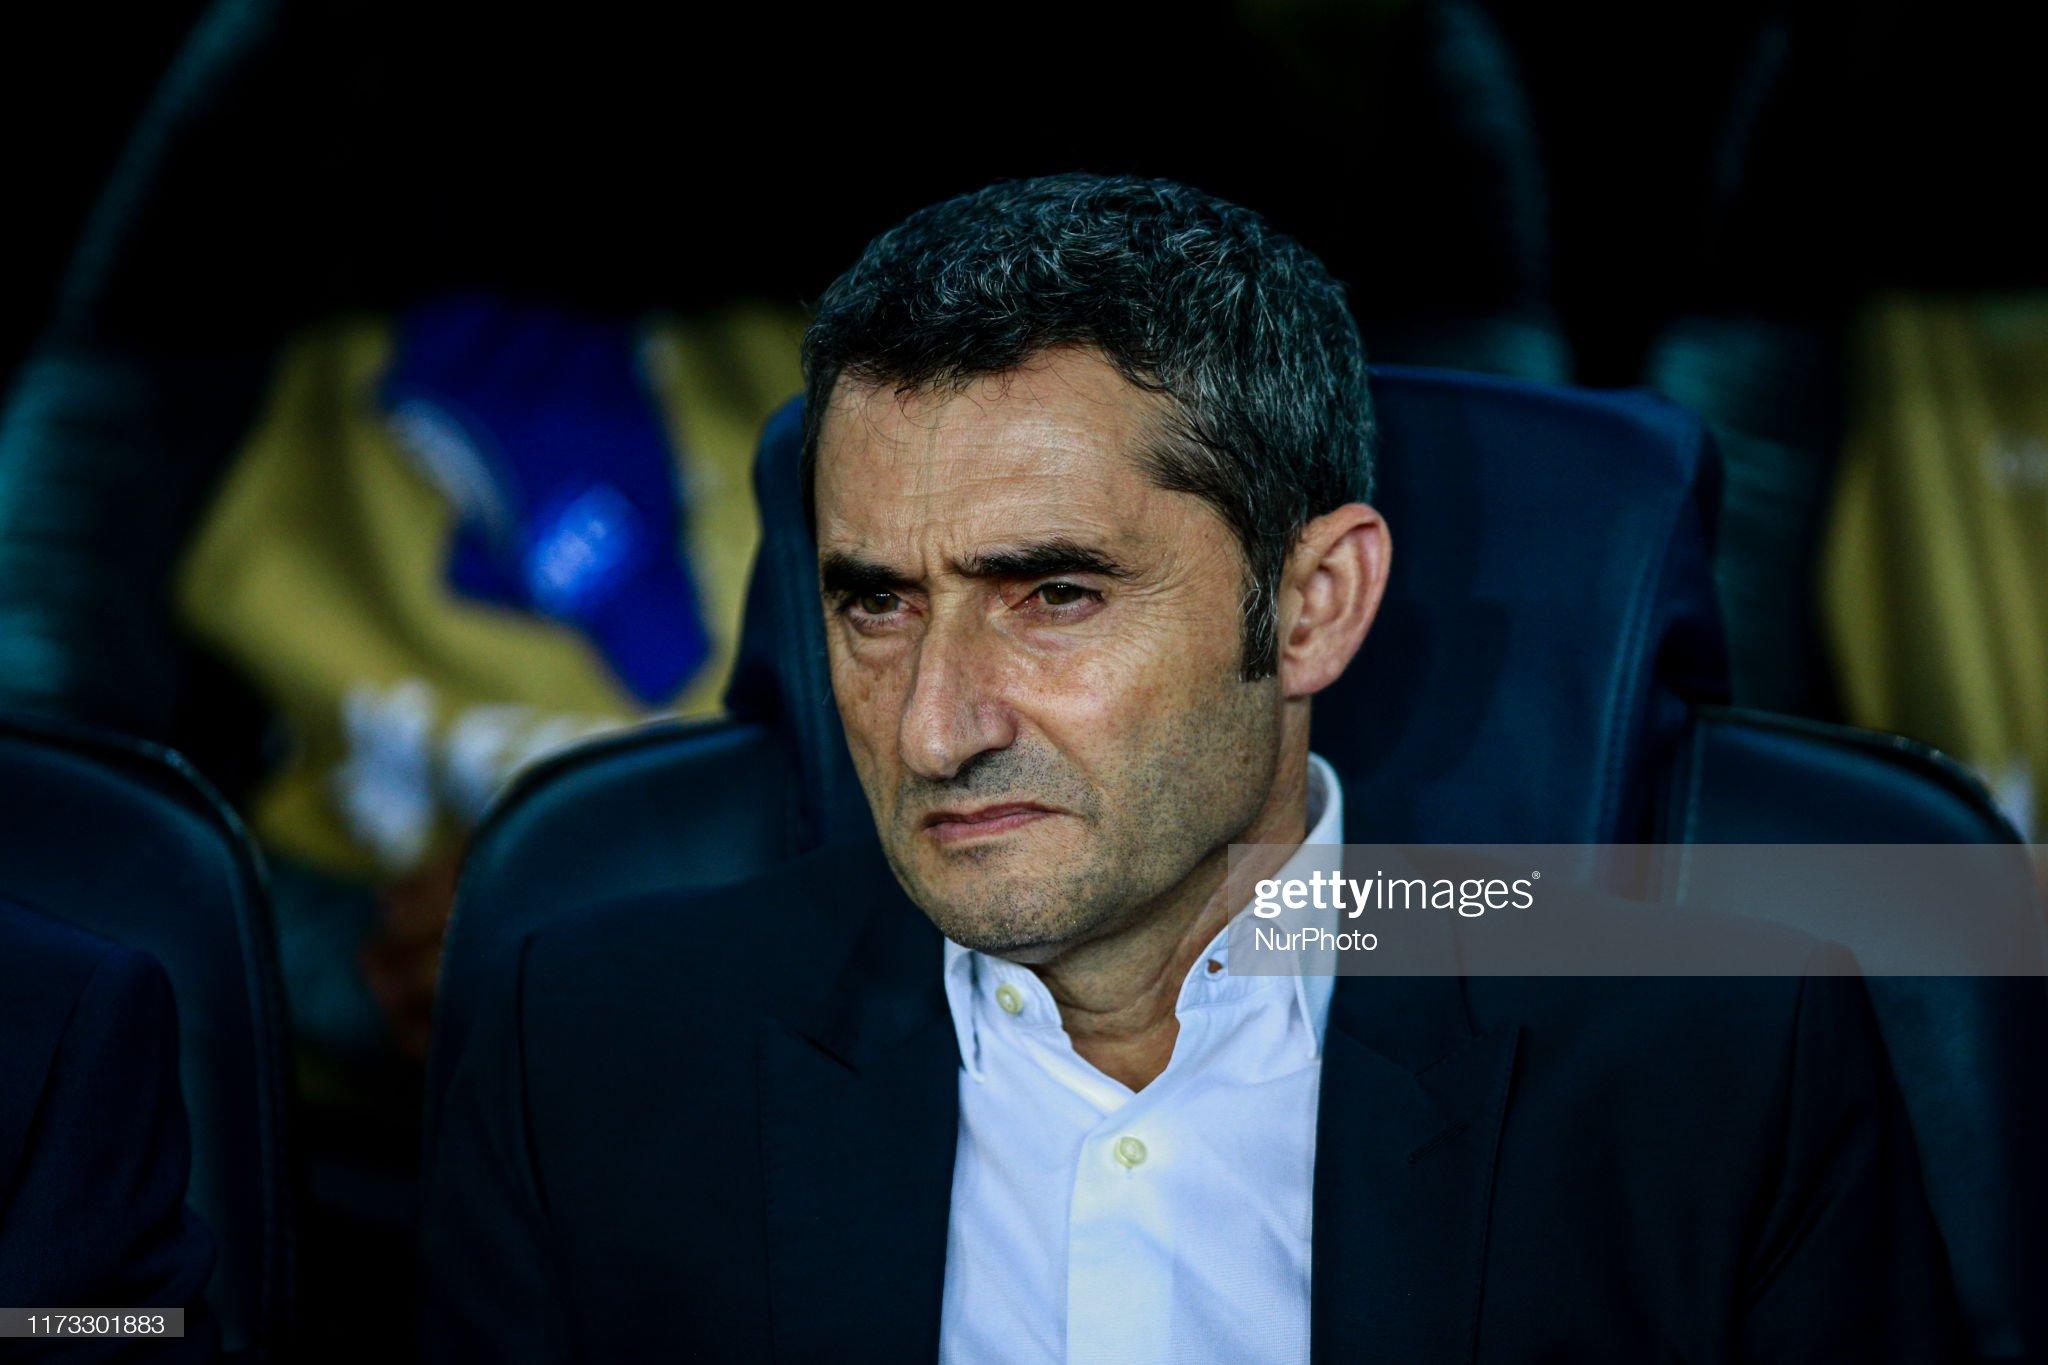 صور مباراة : برشلونة - إنتر 2-1 ( 02-10-2019 )  Ernesto-valverde-from-spain-of-fc-barcelona-during-the-uefa-champions-picture-id1173301883?s=2048x2048